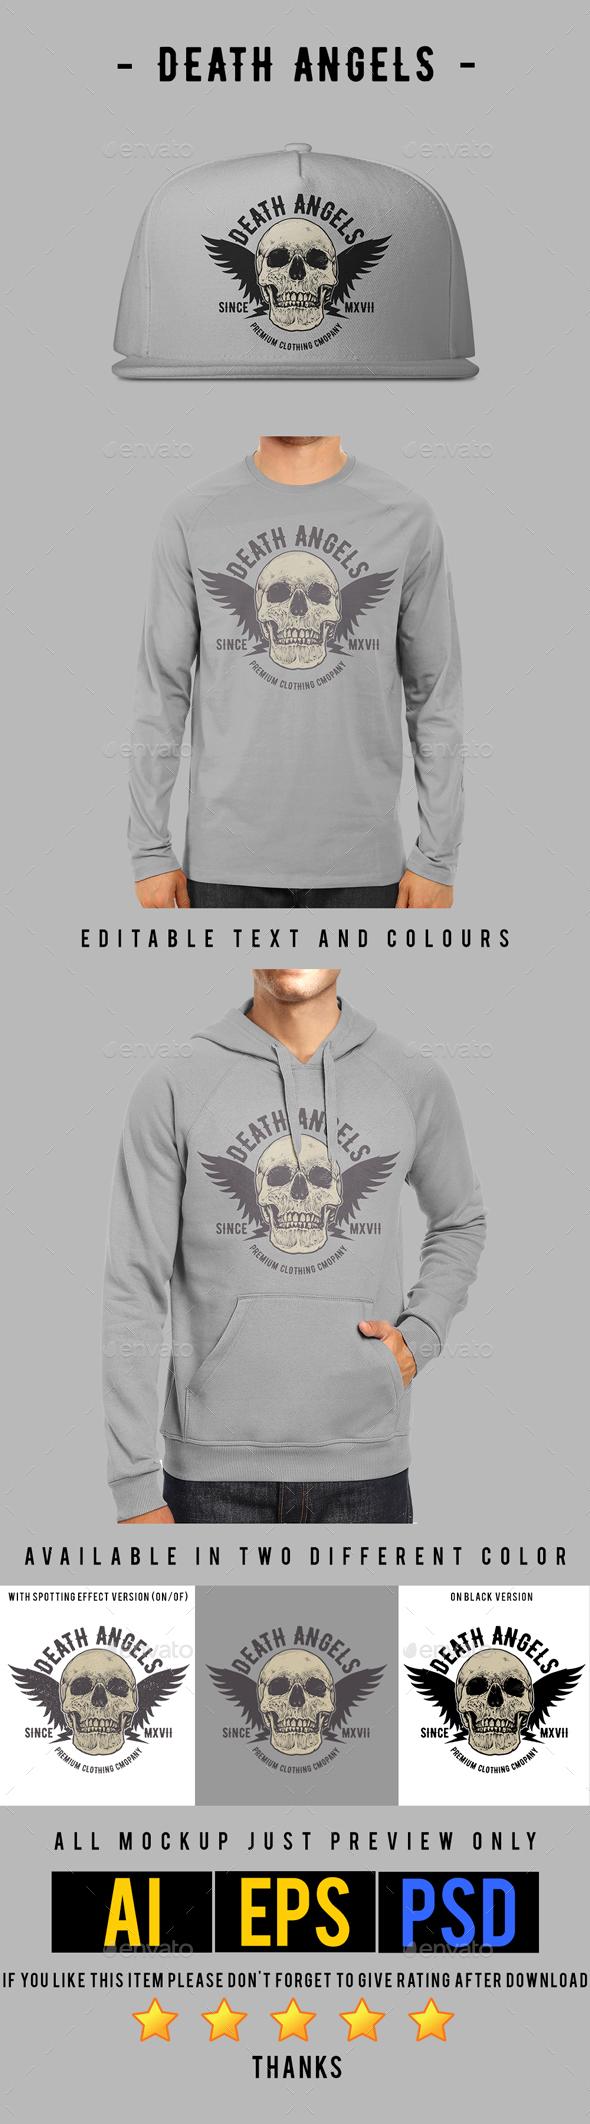 Death Angels T-shirt Design - Designs T-Shirts